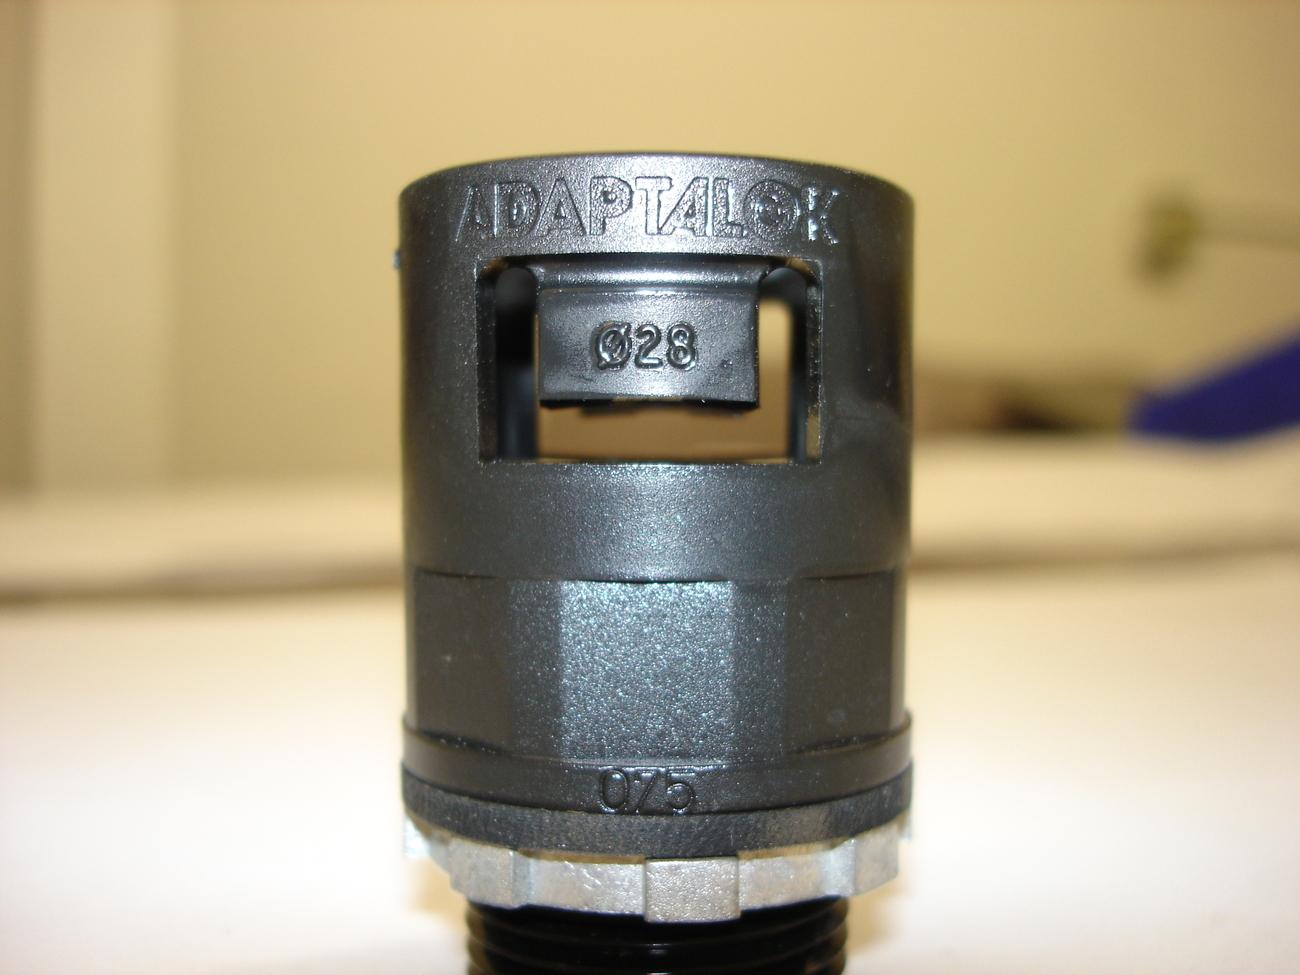 Adaptalok straight One Piece Push-On Liquid Tight Fittings AL28-075-A